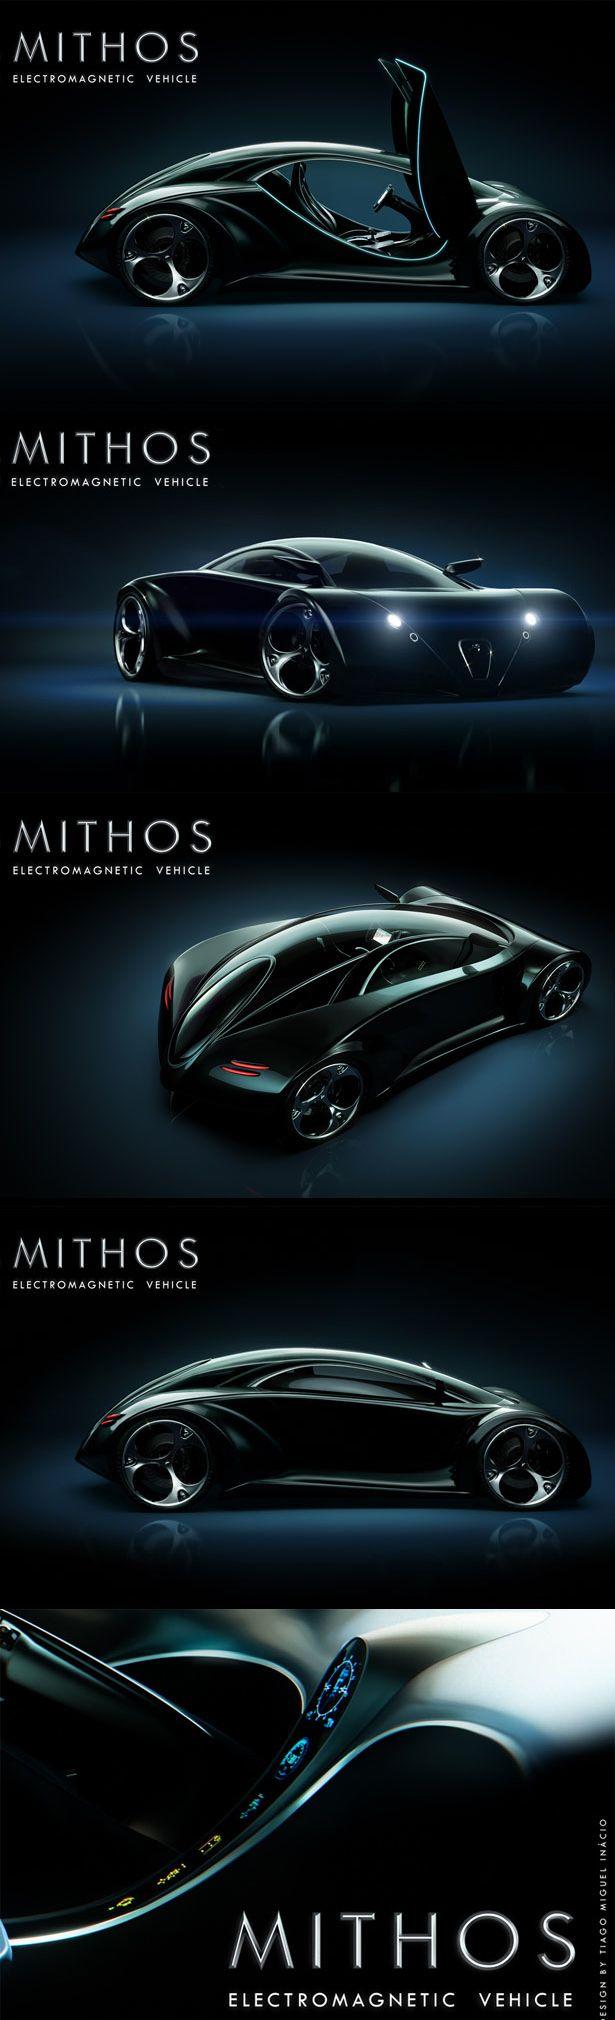 ♂ Futuristic MITHOS Electromagnetic Vehicle Features Crash Resistant Body and Quantum Boost Technology. (Batmobile- live it.)